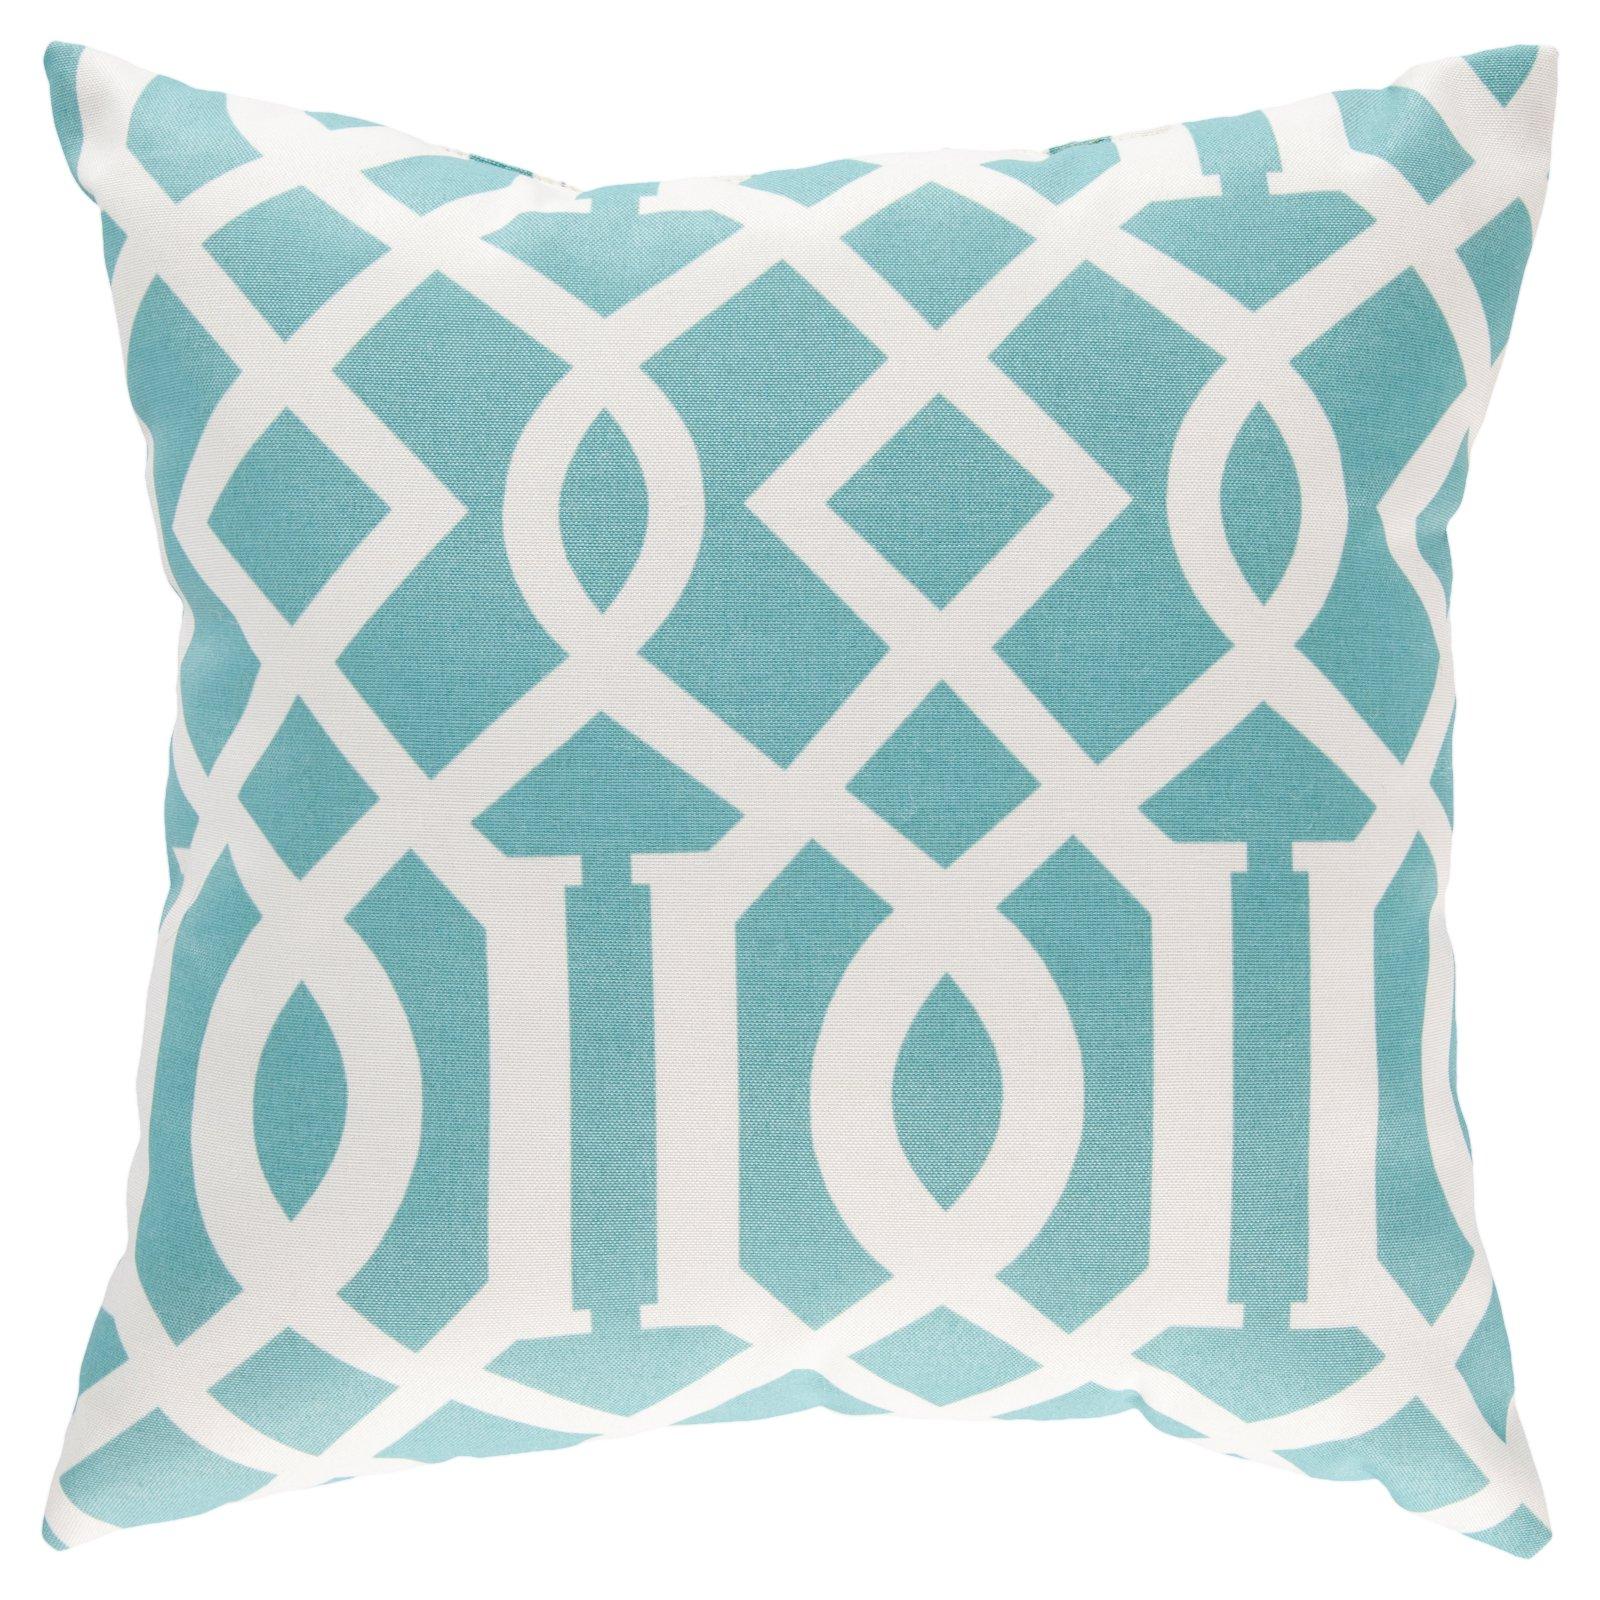 Surya Radiant Roman Numeral Indoor/Outdoor Pillow